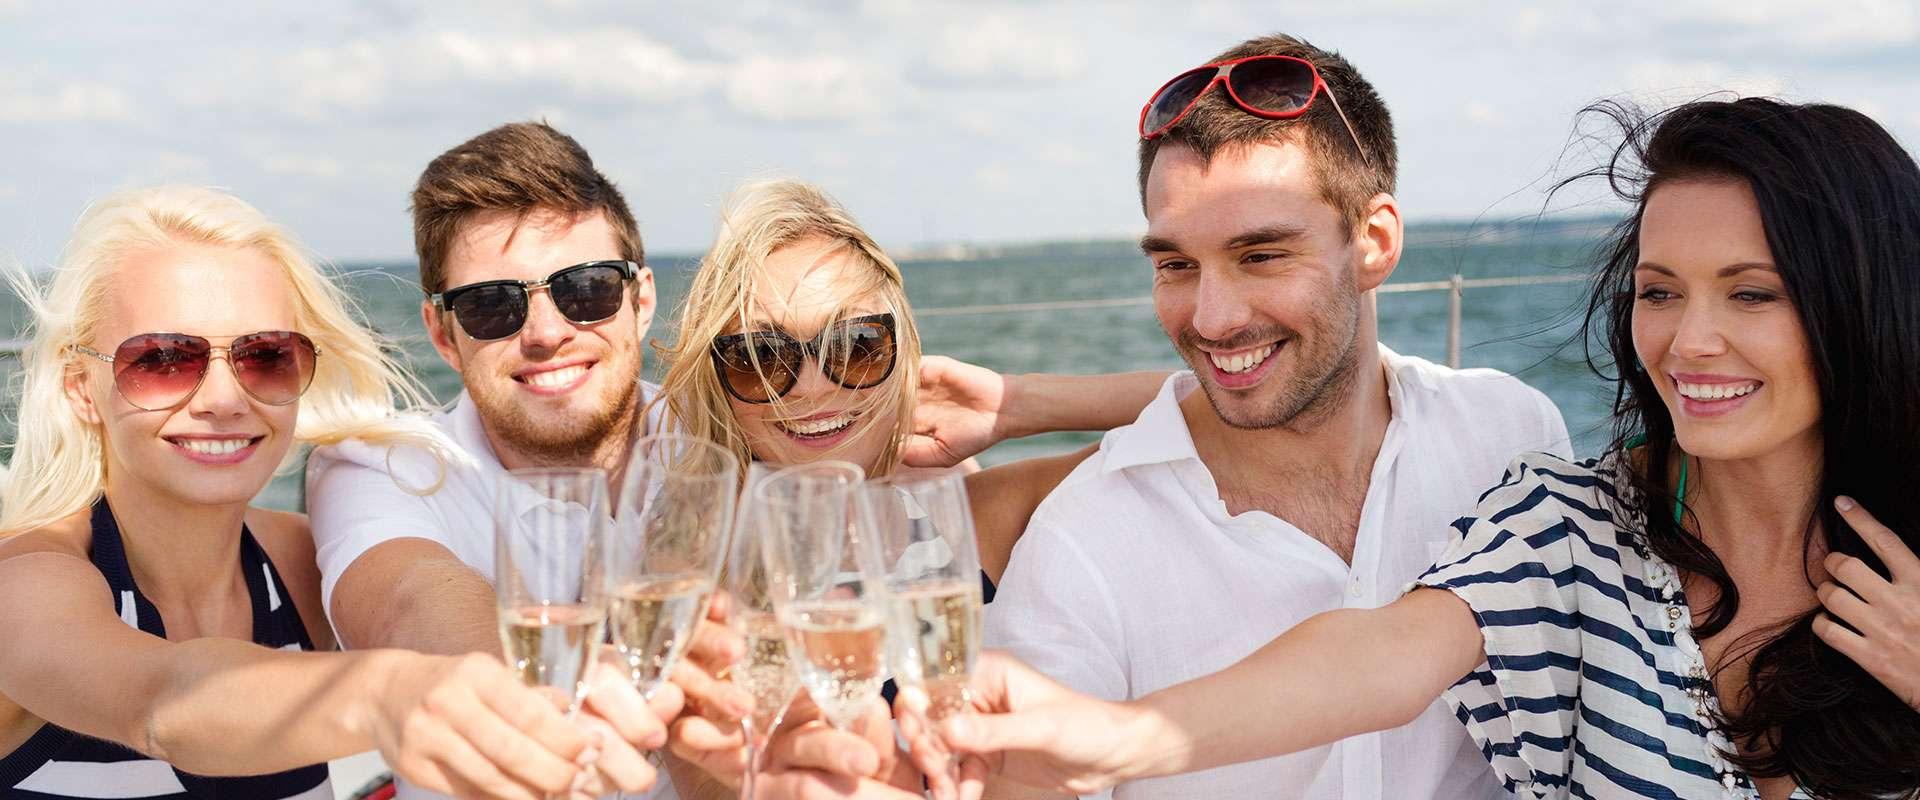 hinckley-yacht-charters